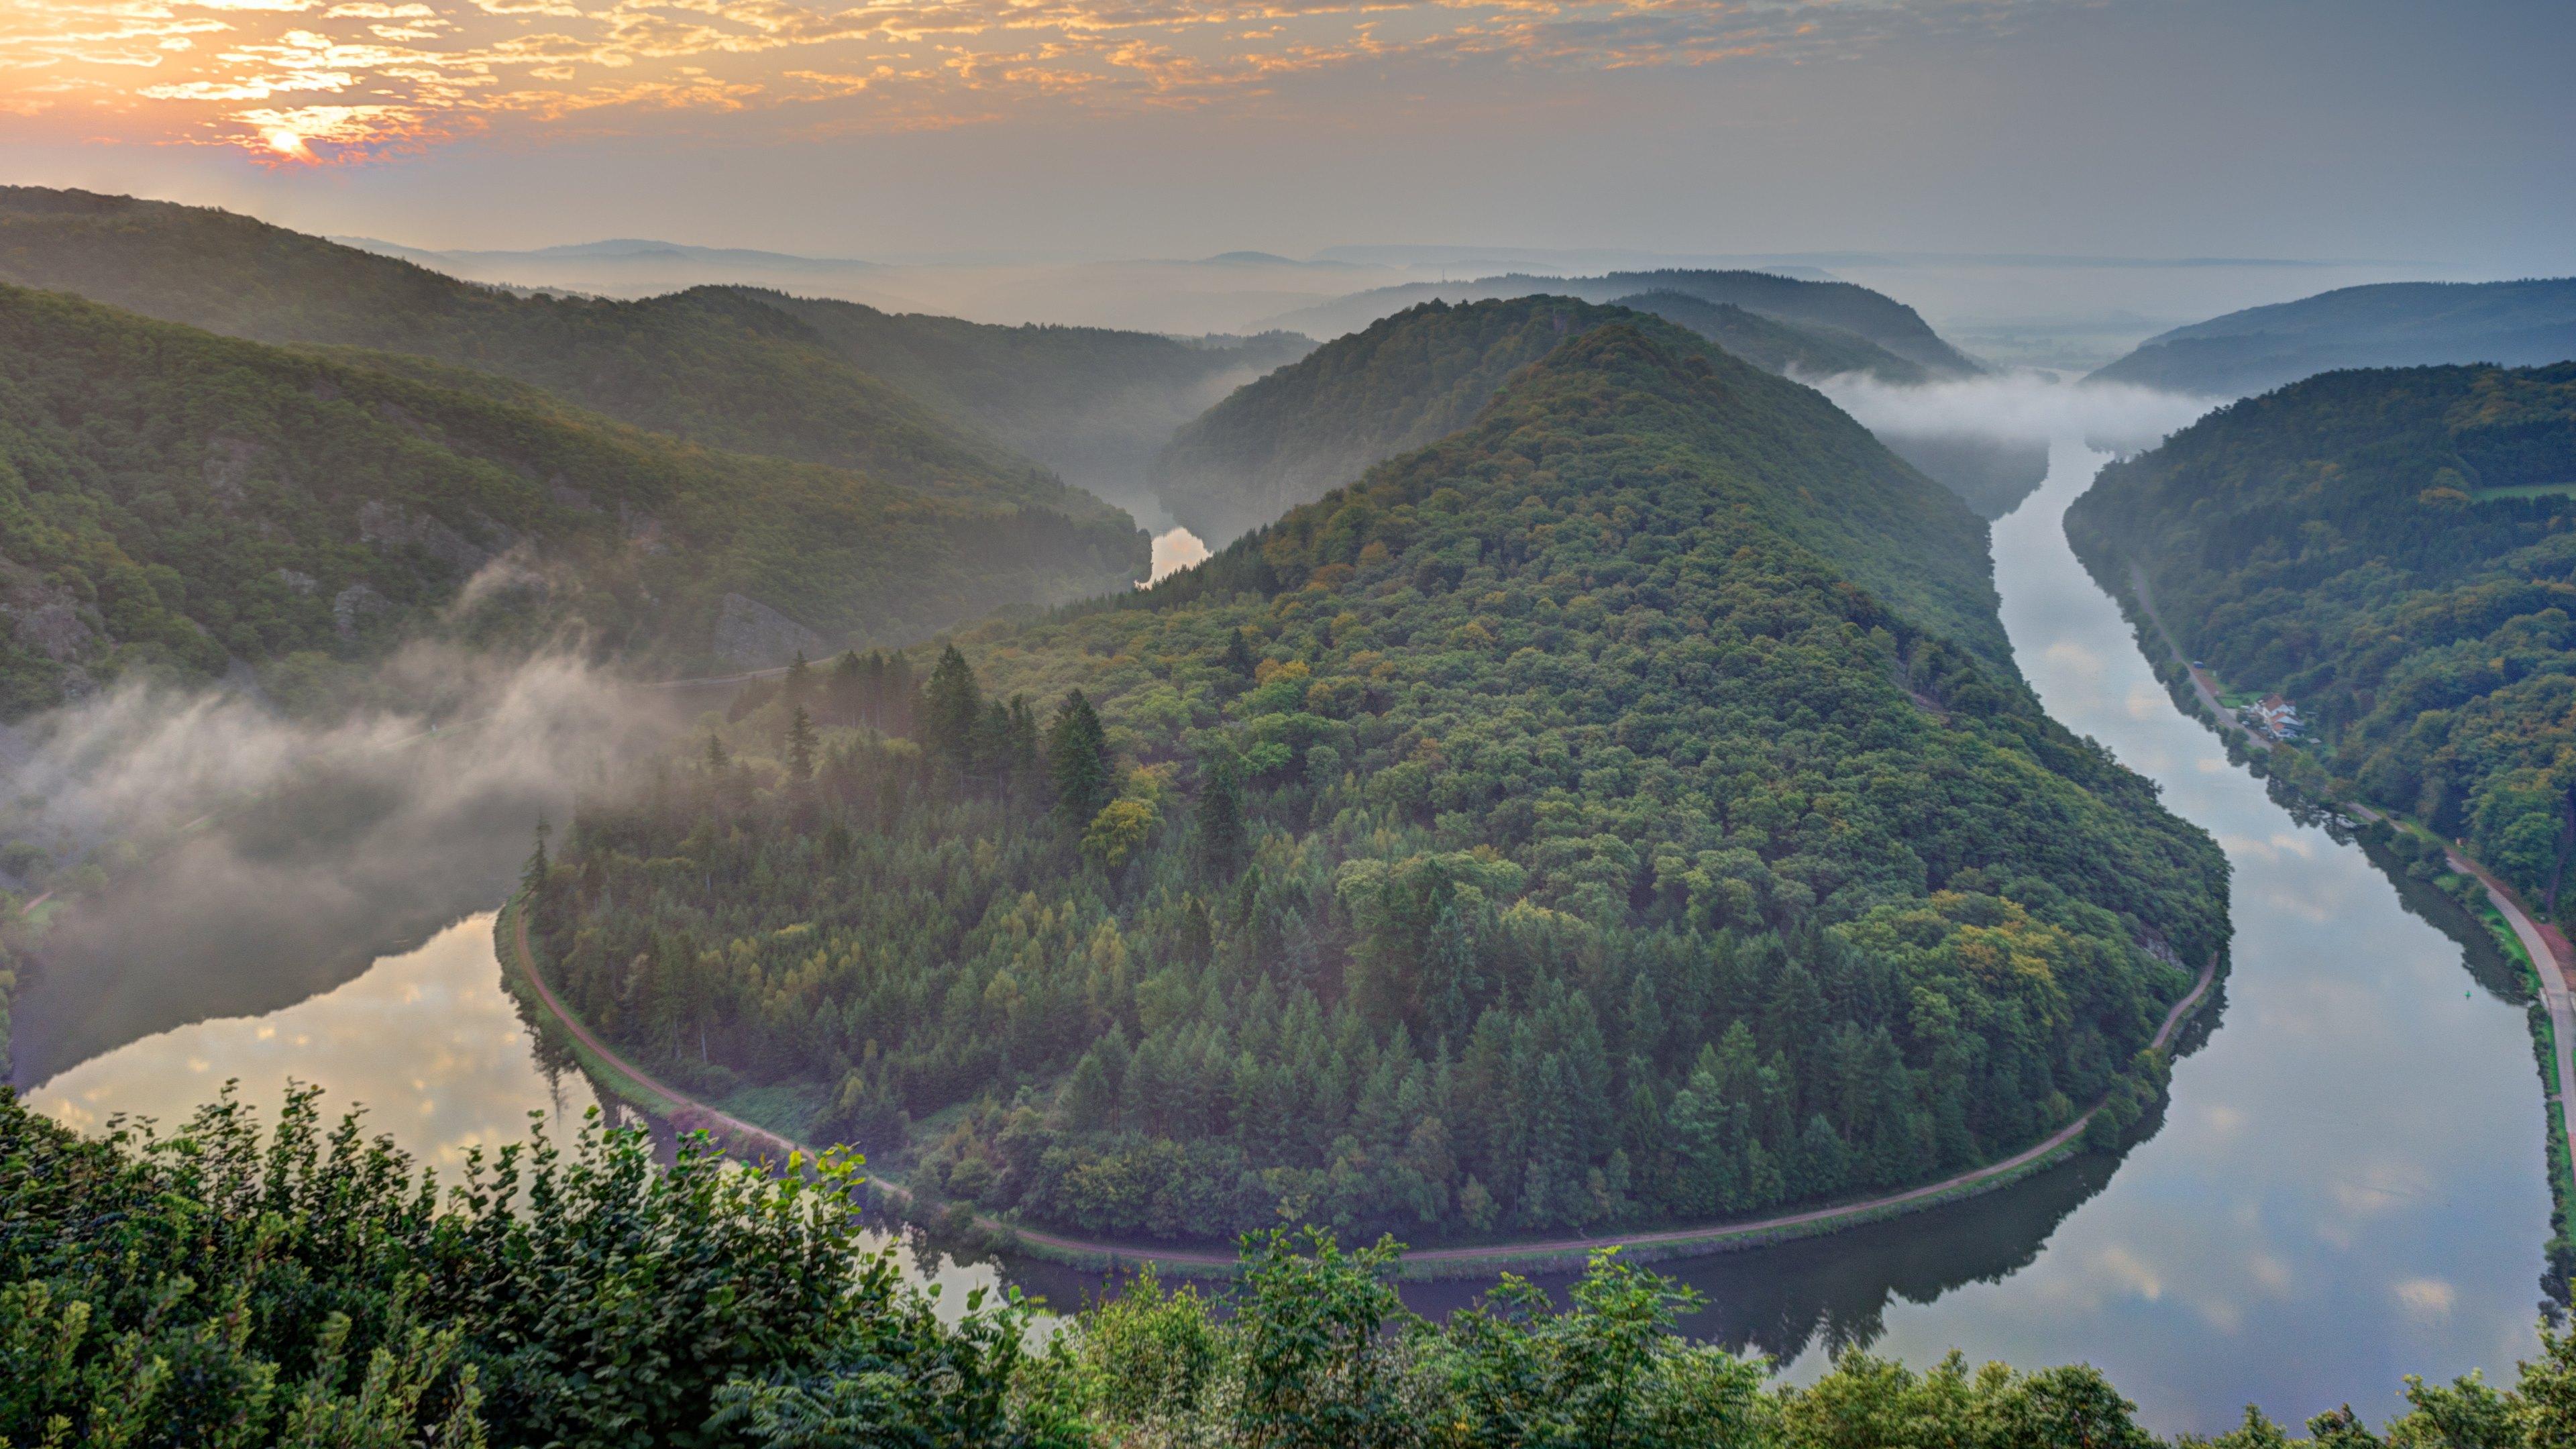 4k panoramic wallpaper - photo #35